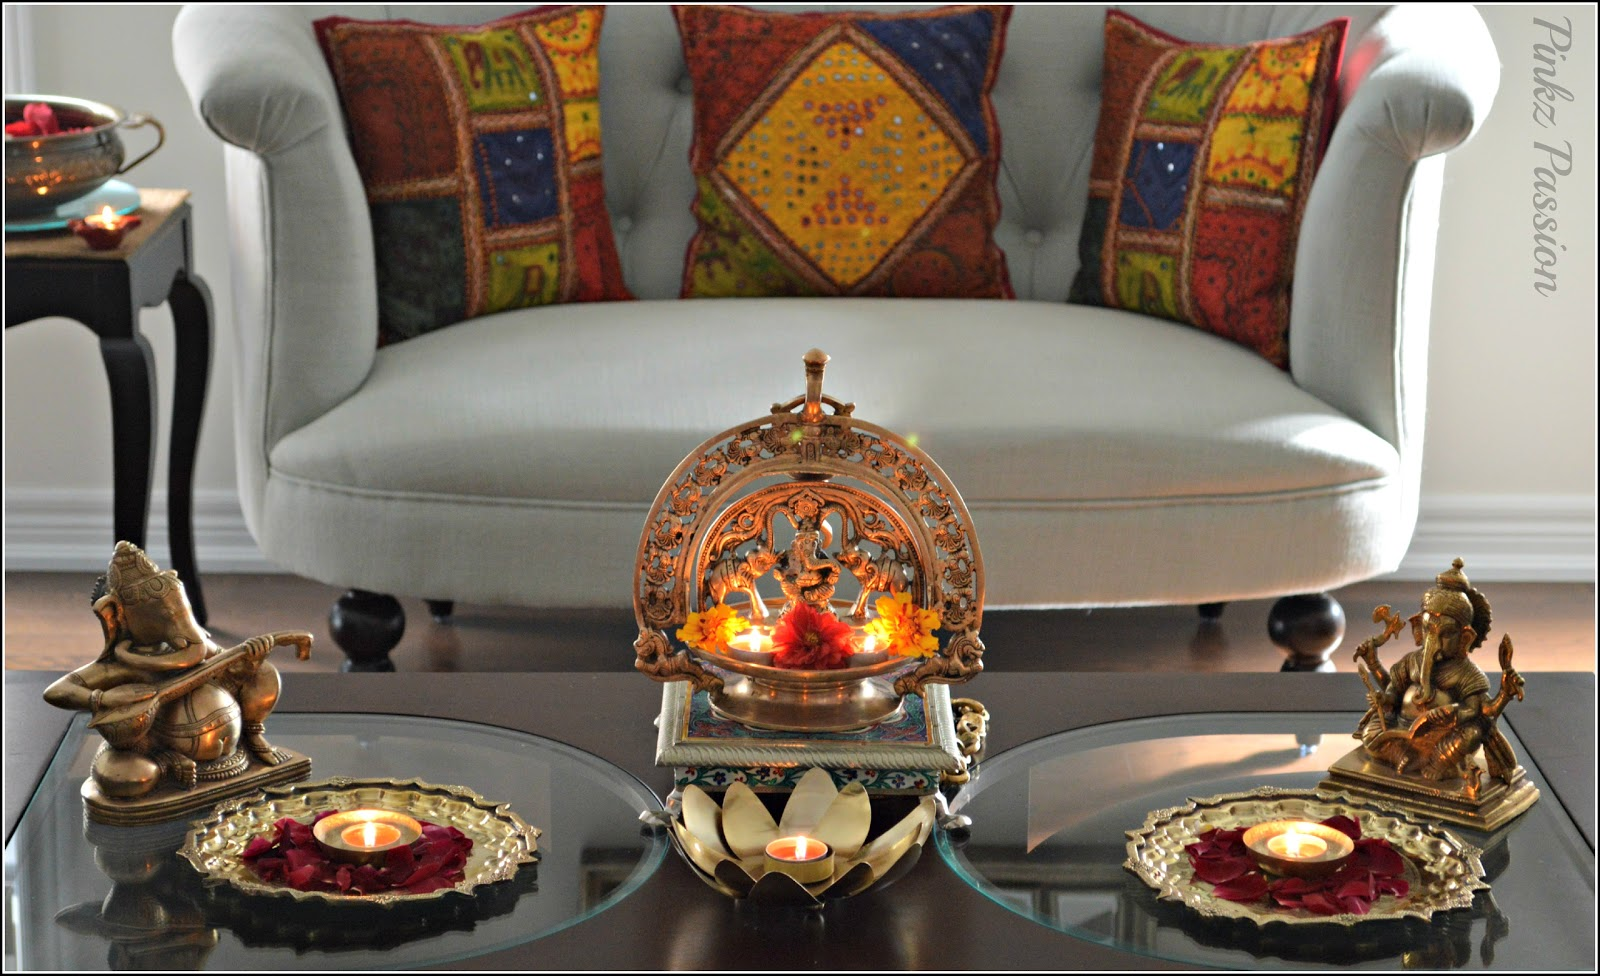 Pinkz passion diwali inspiration 2 home tour for Home decorations diwali